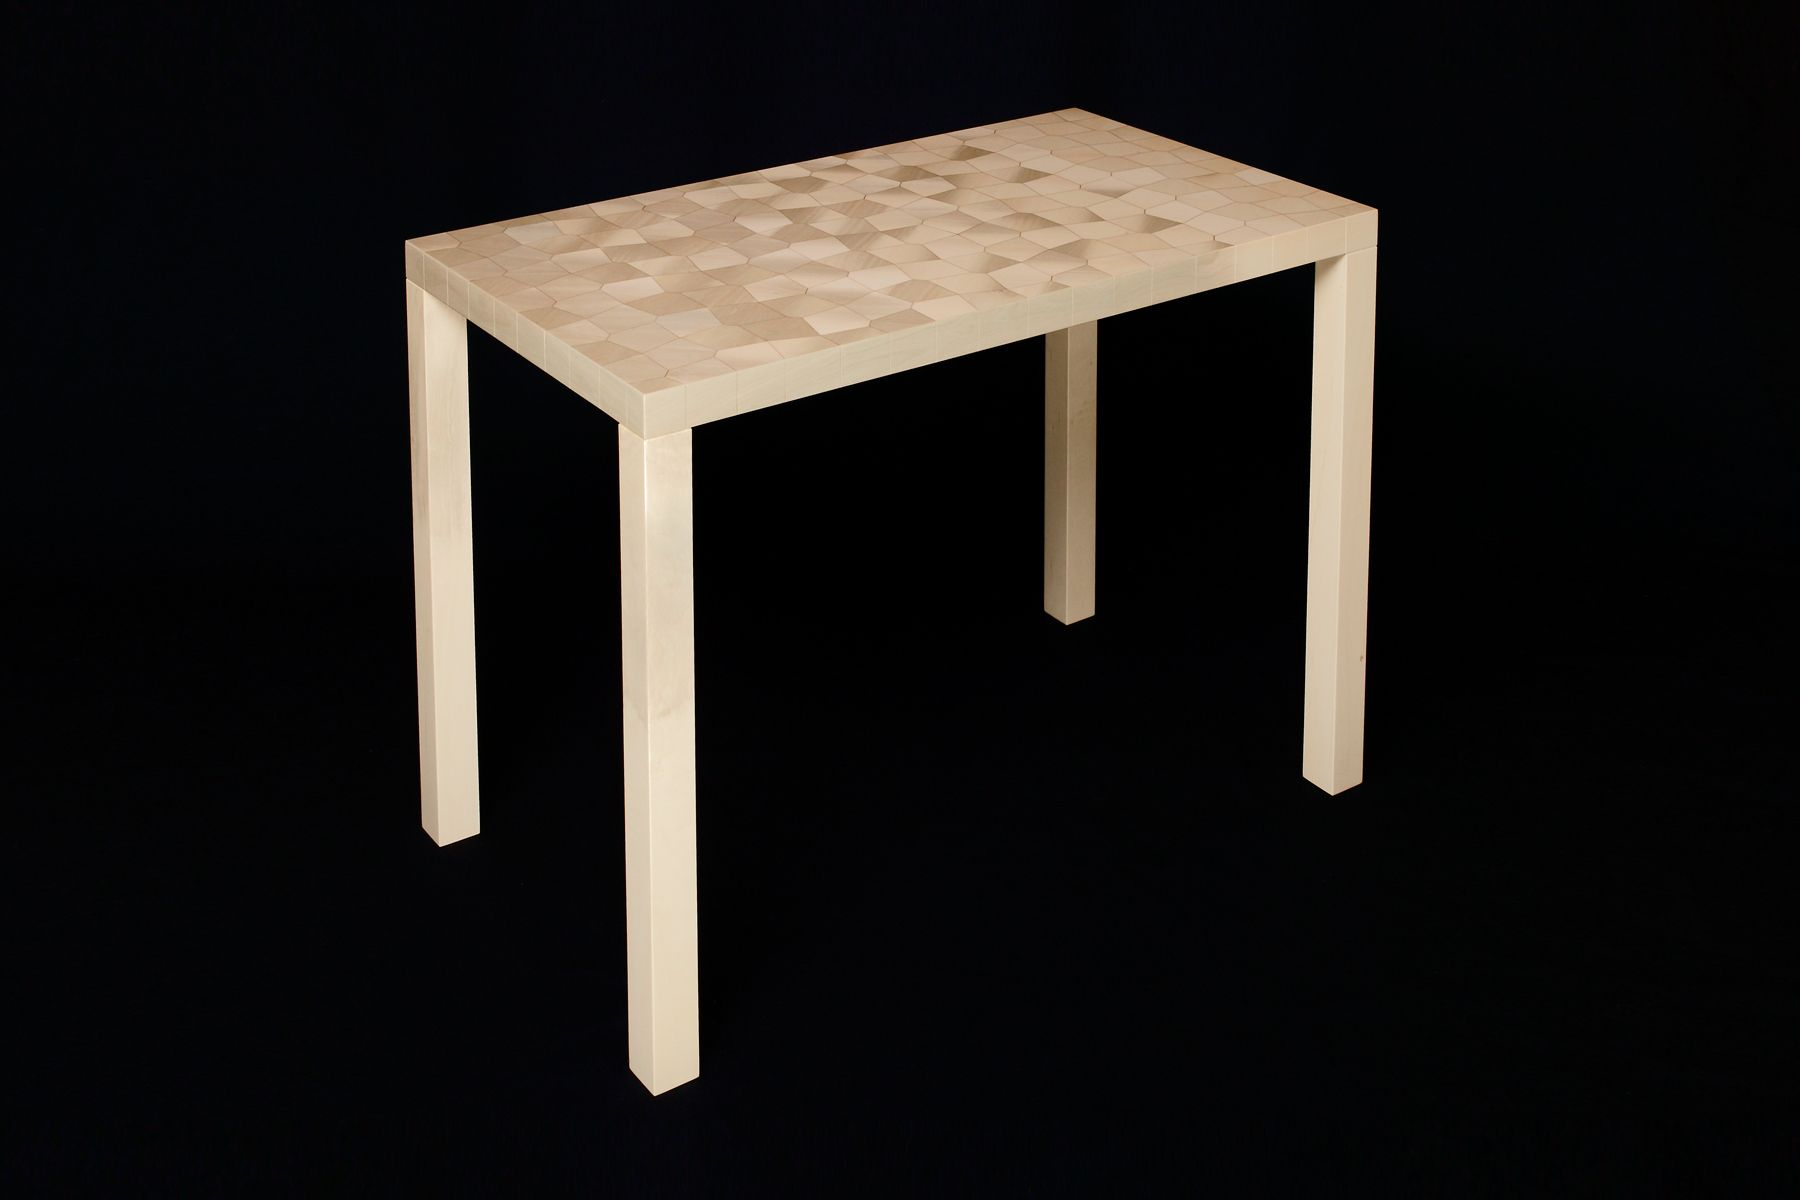 1aaron_levine_contemporary_modern_studio_furniture_maker_wood_woodworker_art_artist_northwest_parquetry_tessellation_holly_eutectic_decorative_table_detail2.jpg